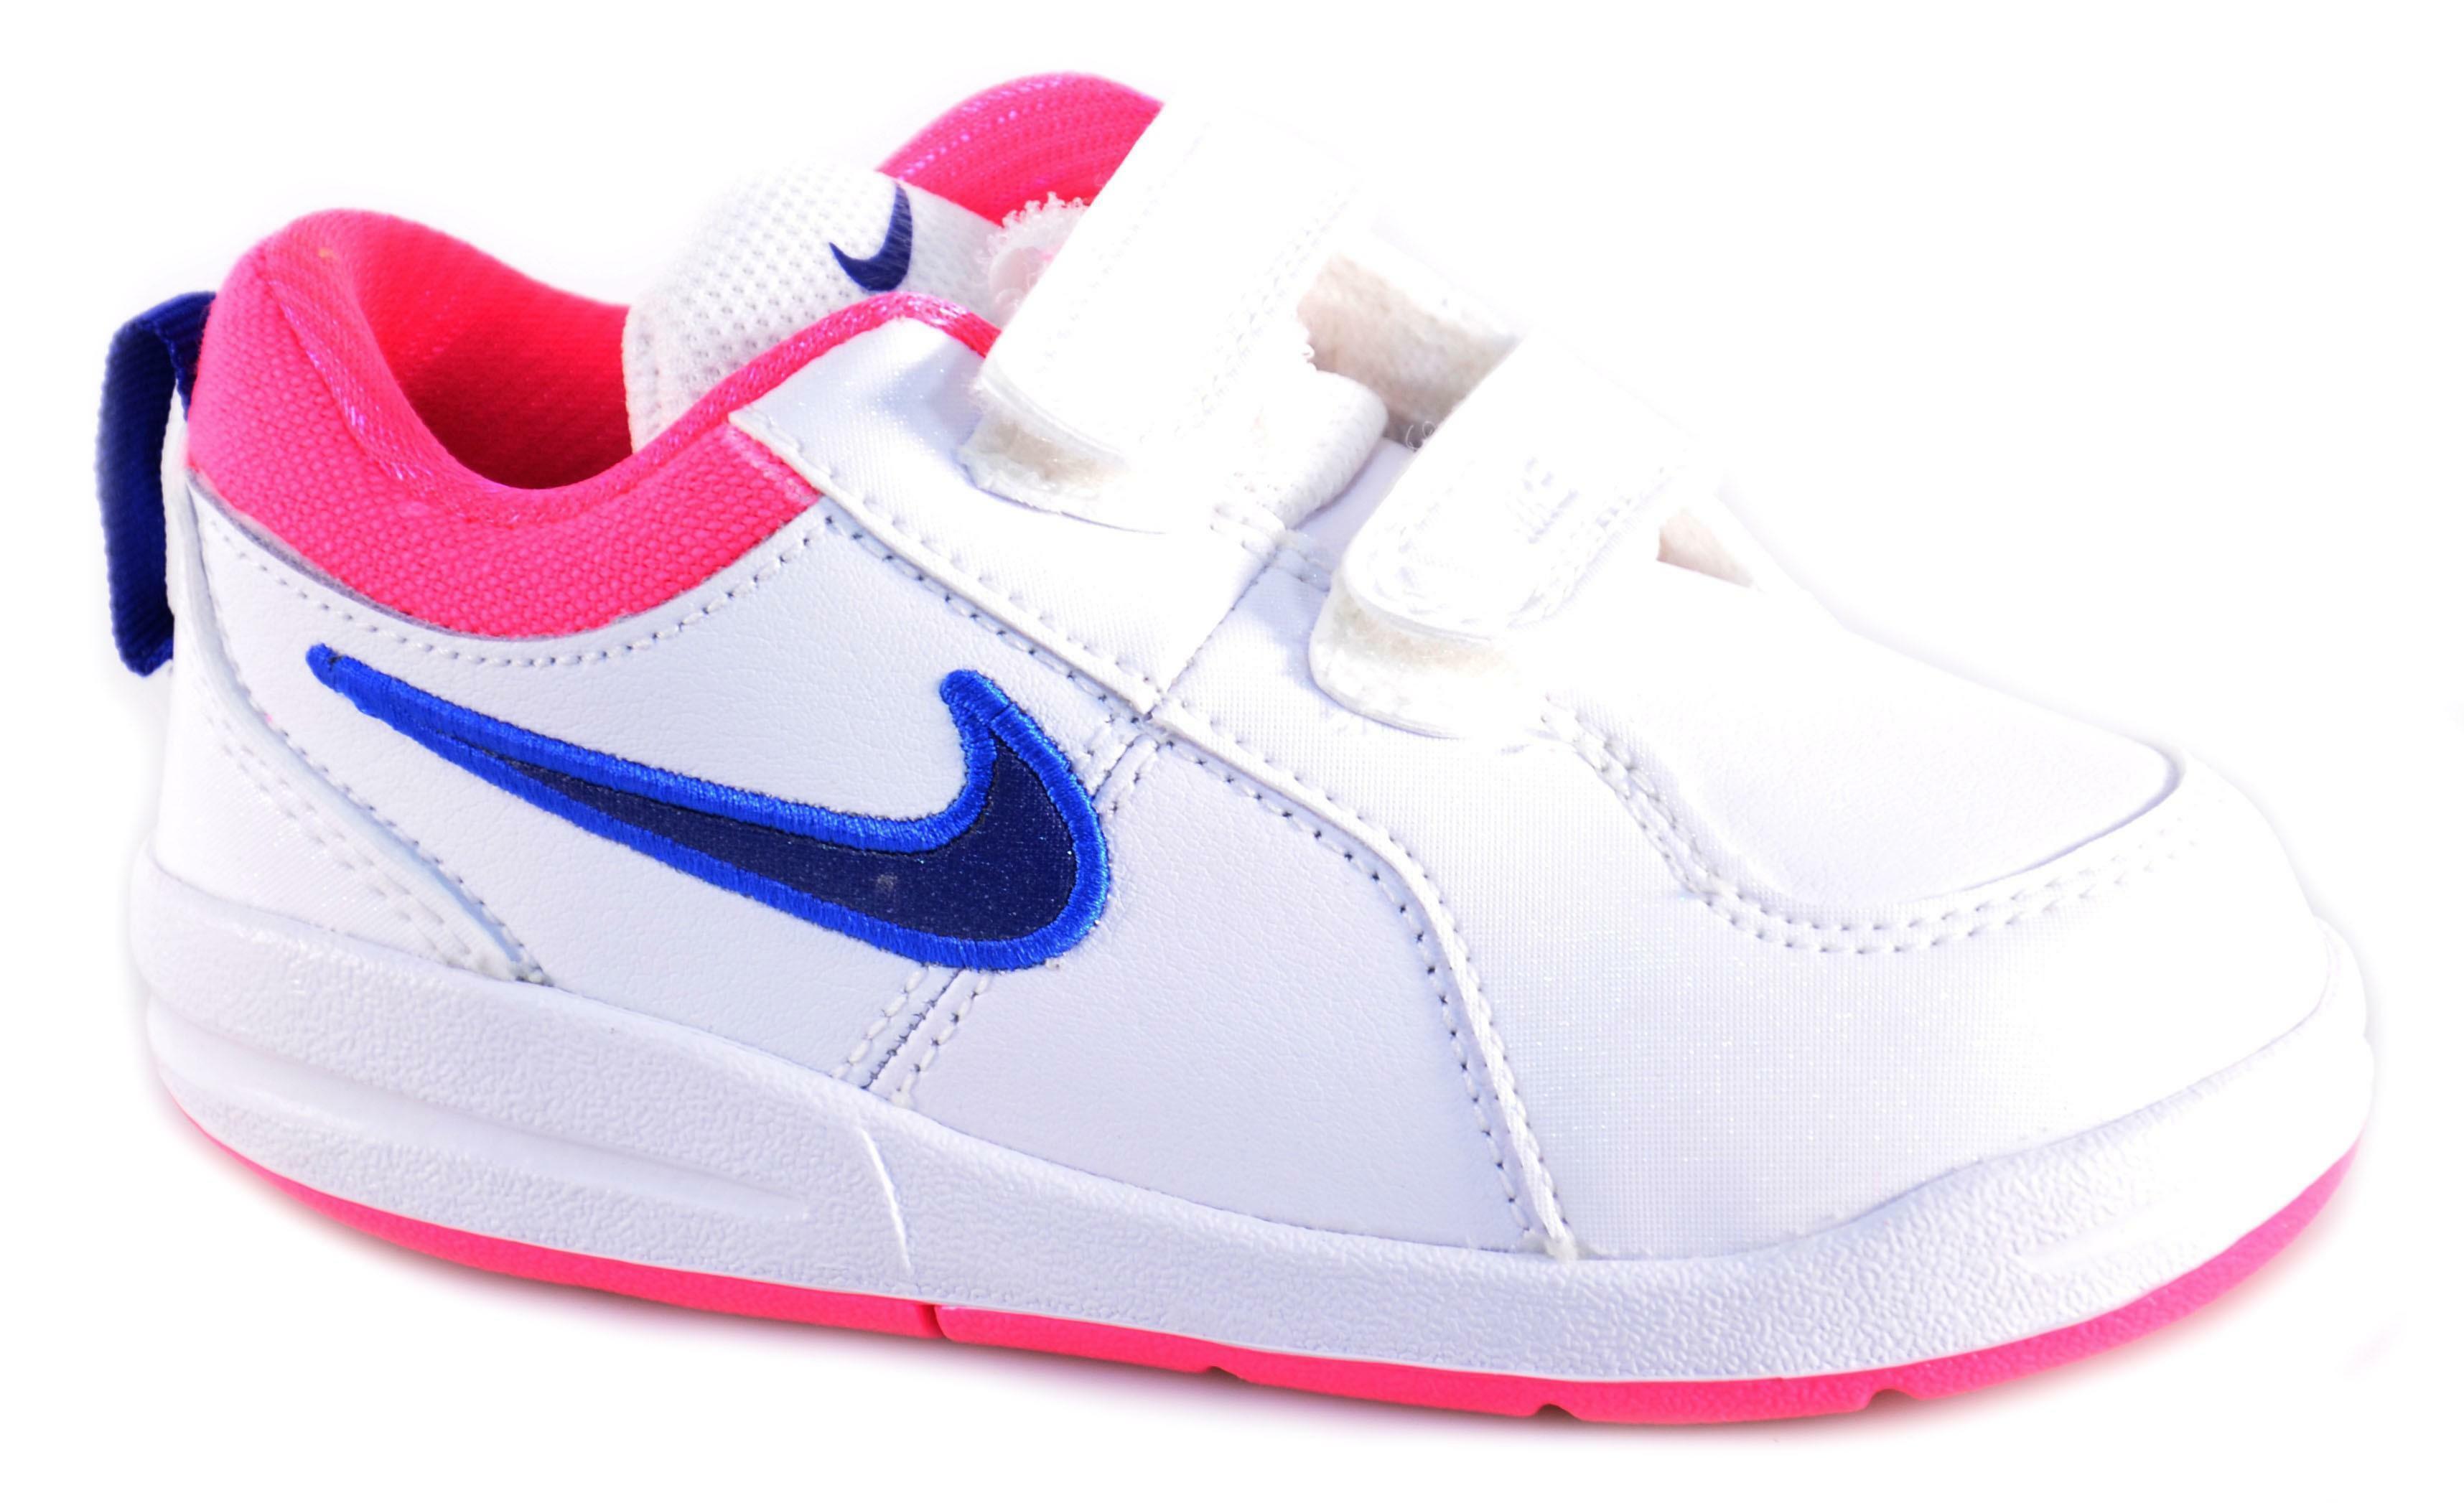 Nike Rosa 4psvScarpe 454477 Blu Velcro Pico Pelle Bambina Bianche 6ybgf7